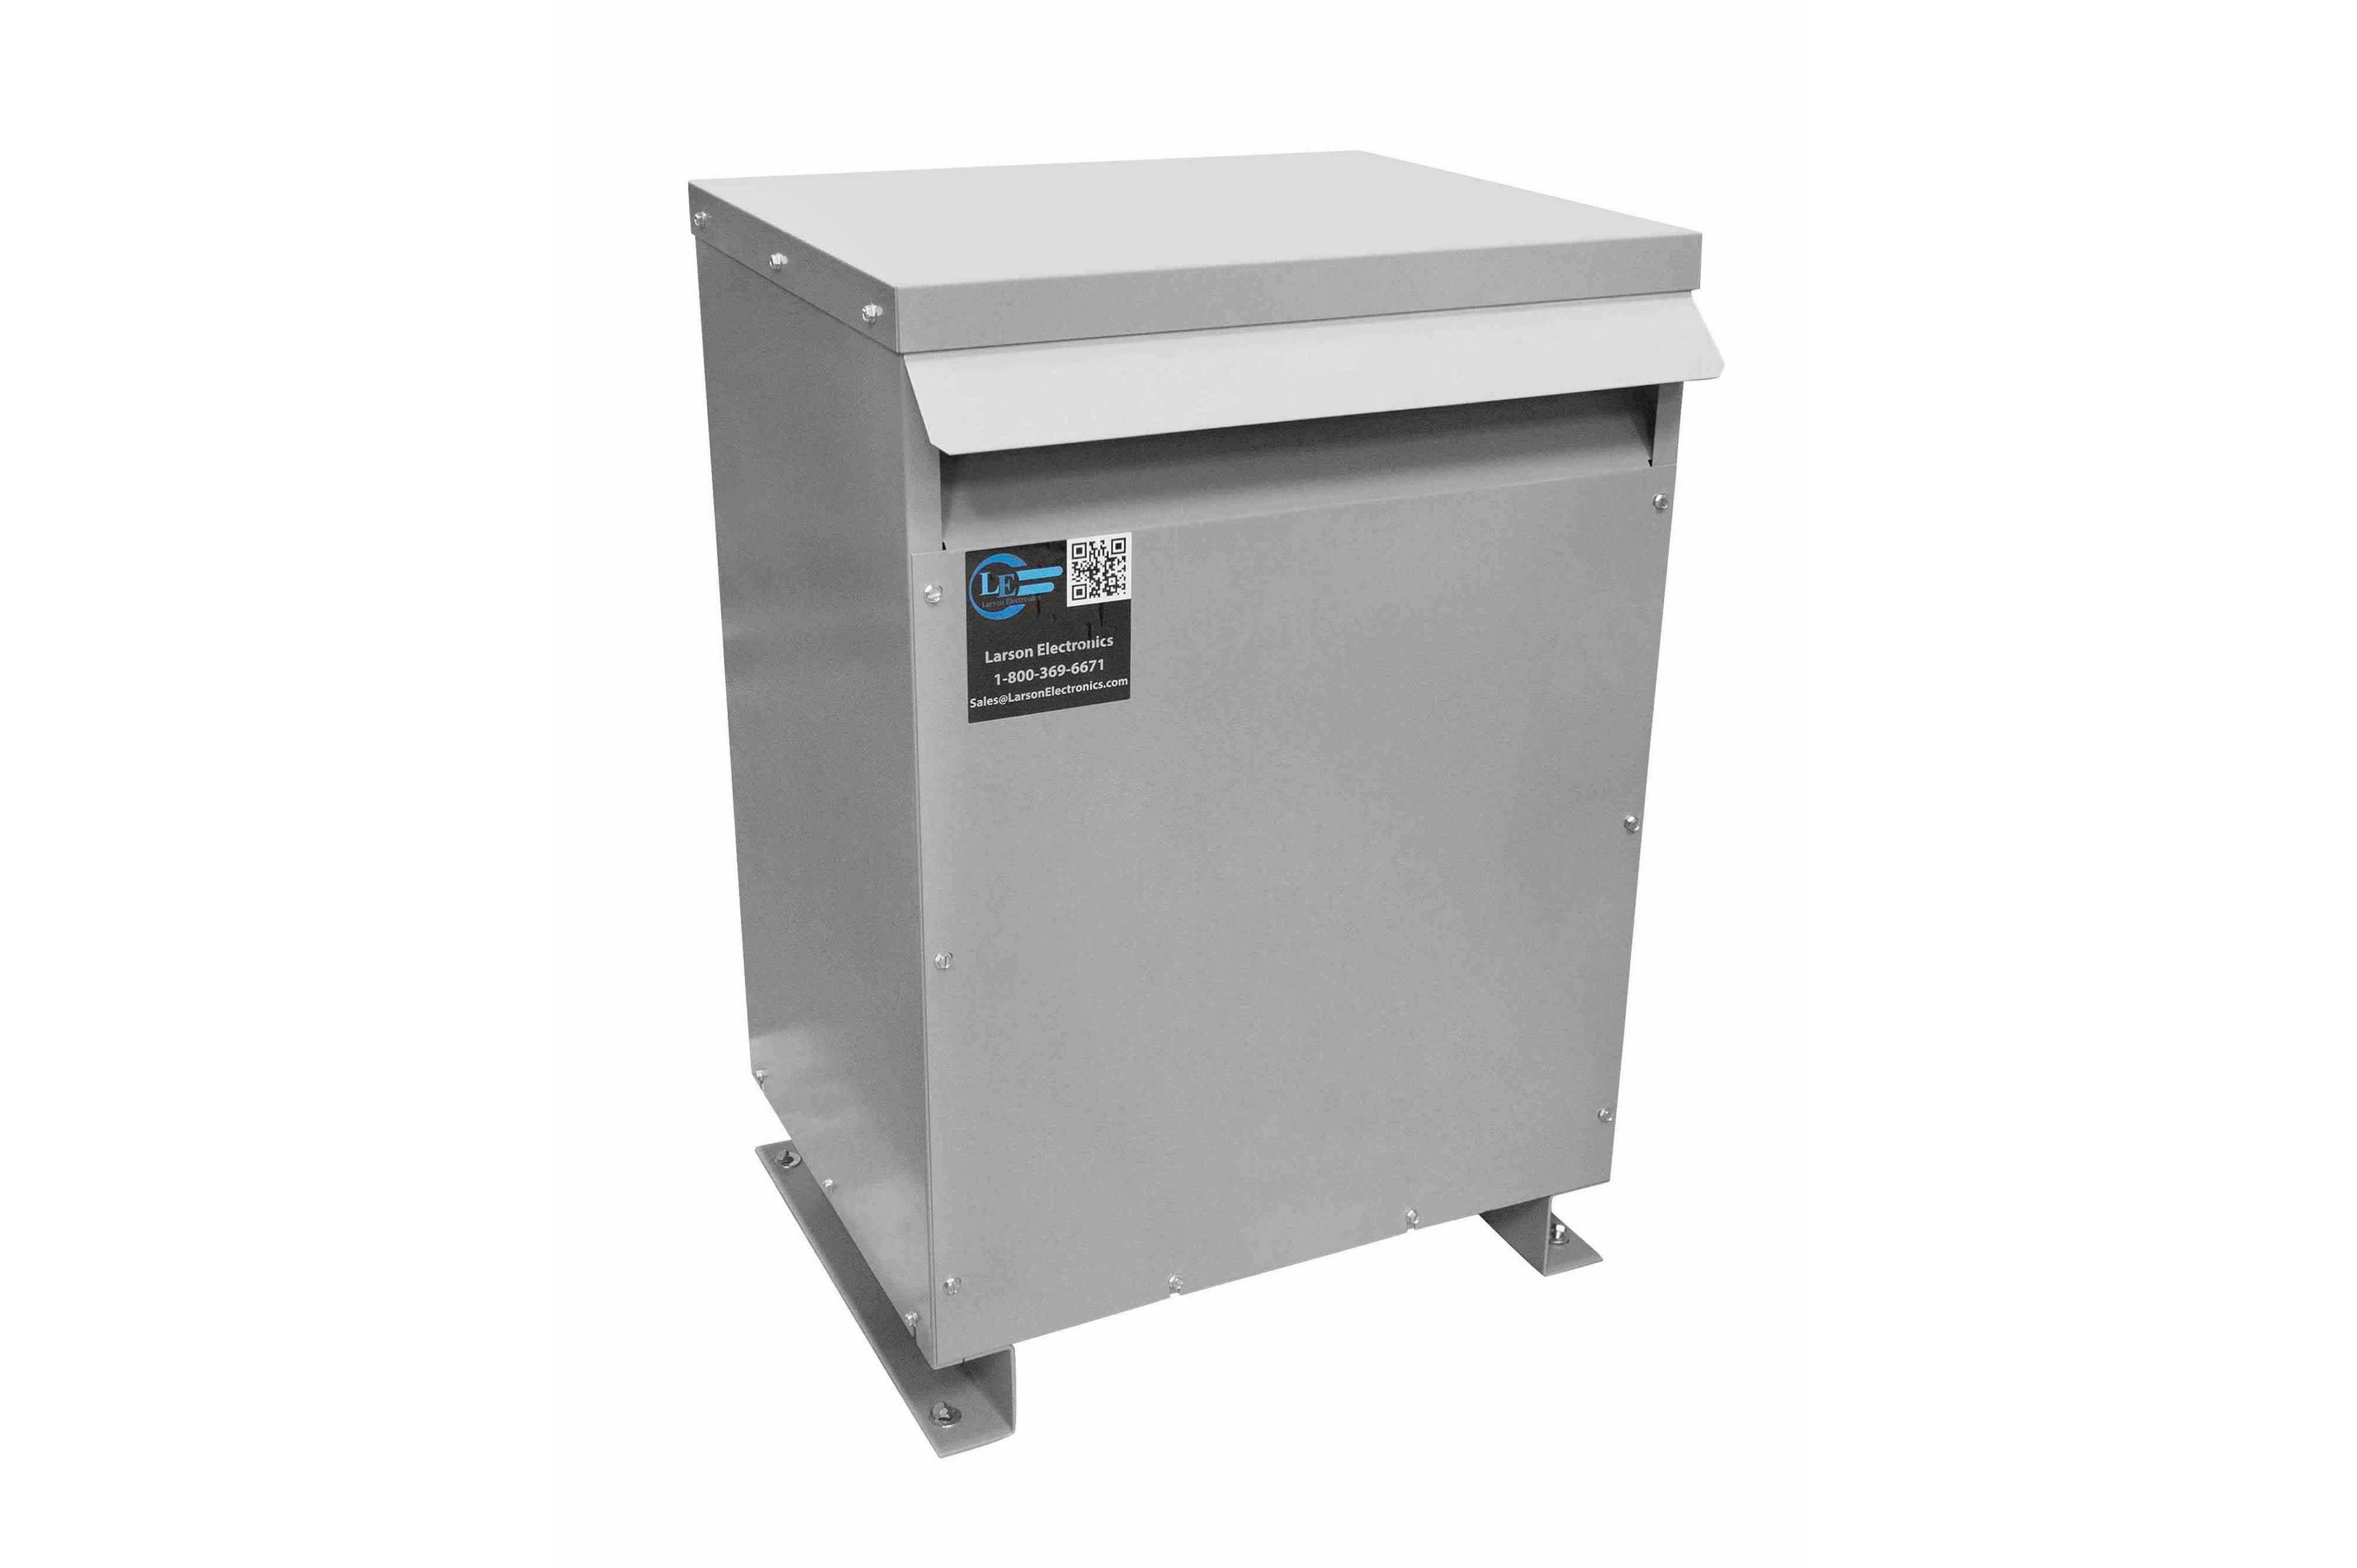 37.5 kVA 3PH Isolation Transformer, 208V Wye Primary, 600V Delta Secondary, N3R, Ventilated, 60 Hz